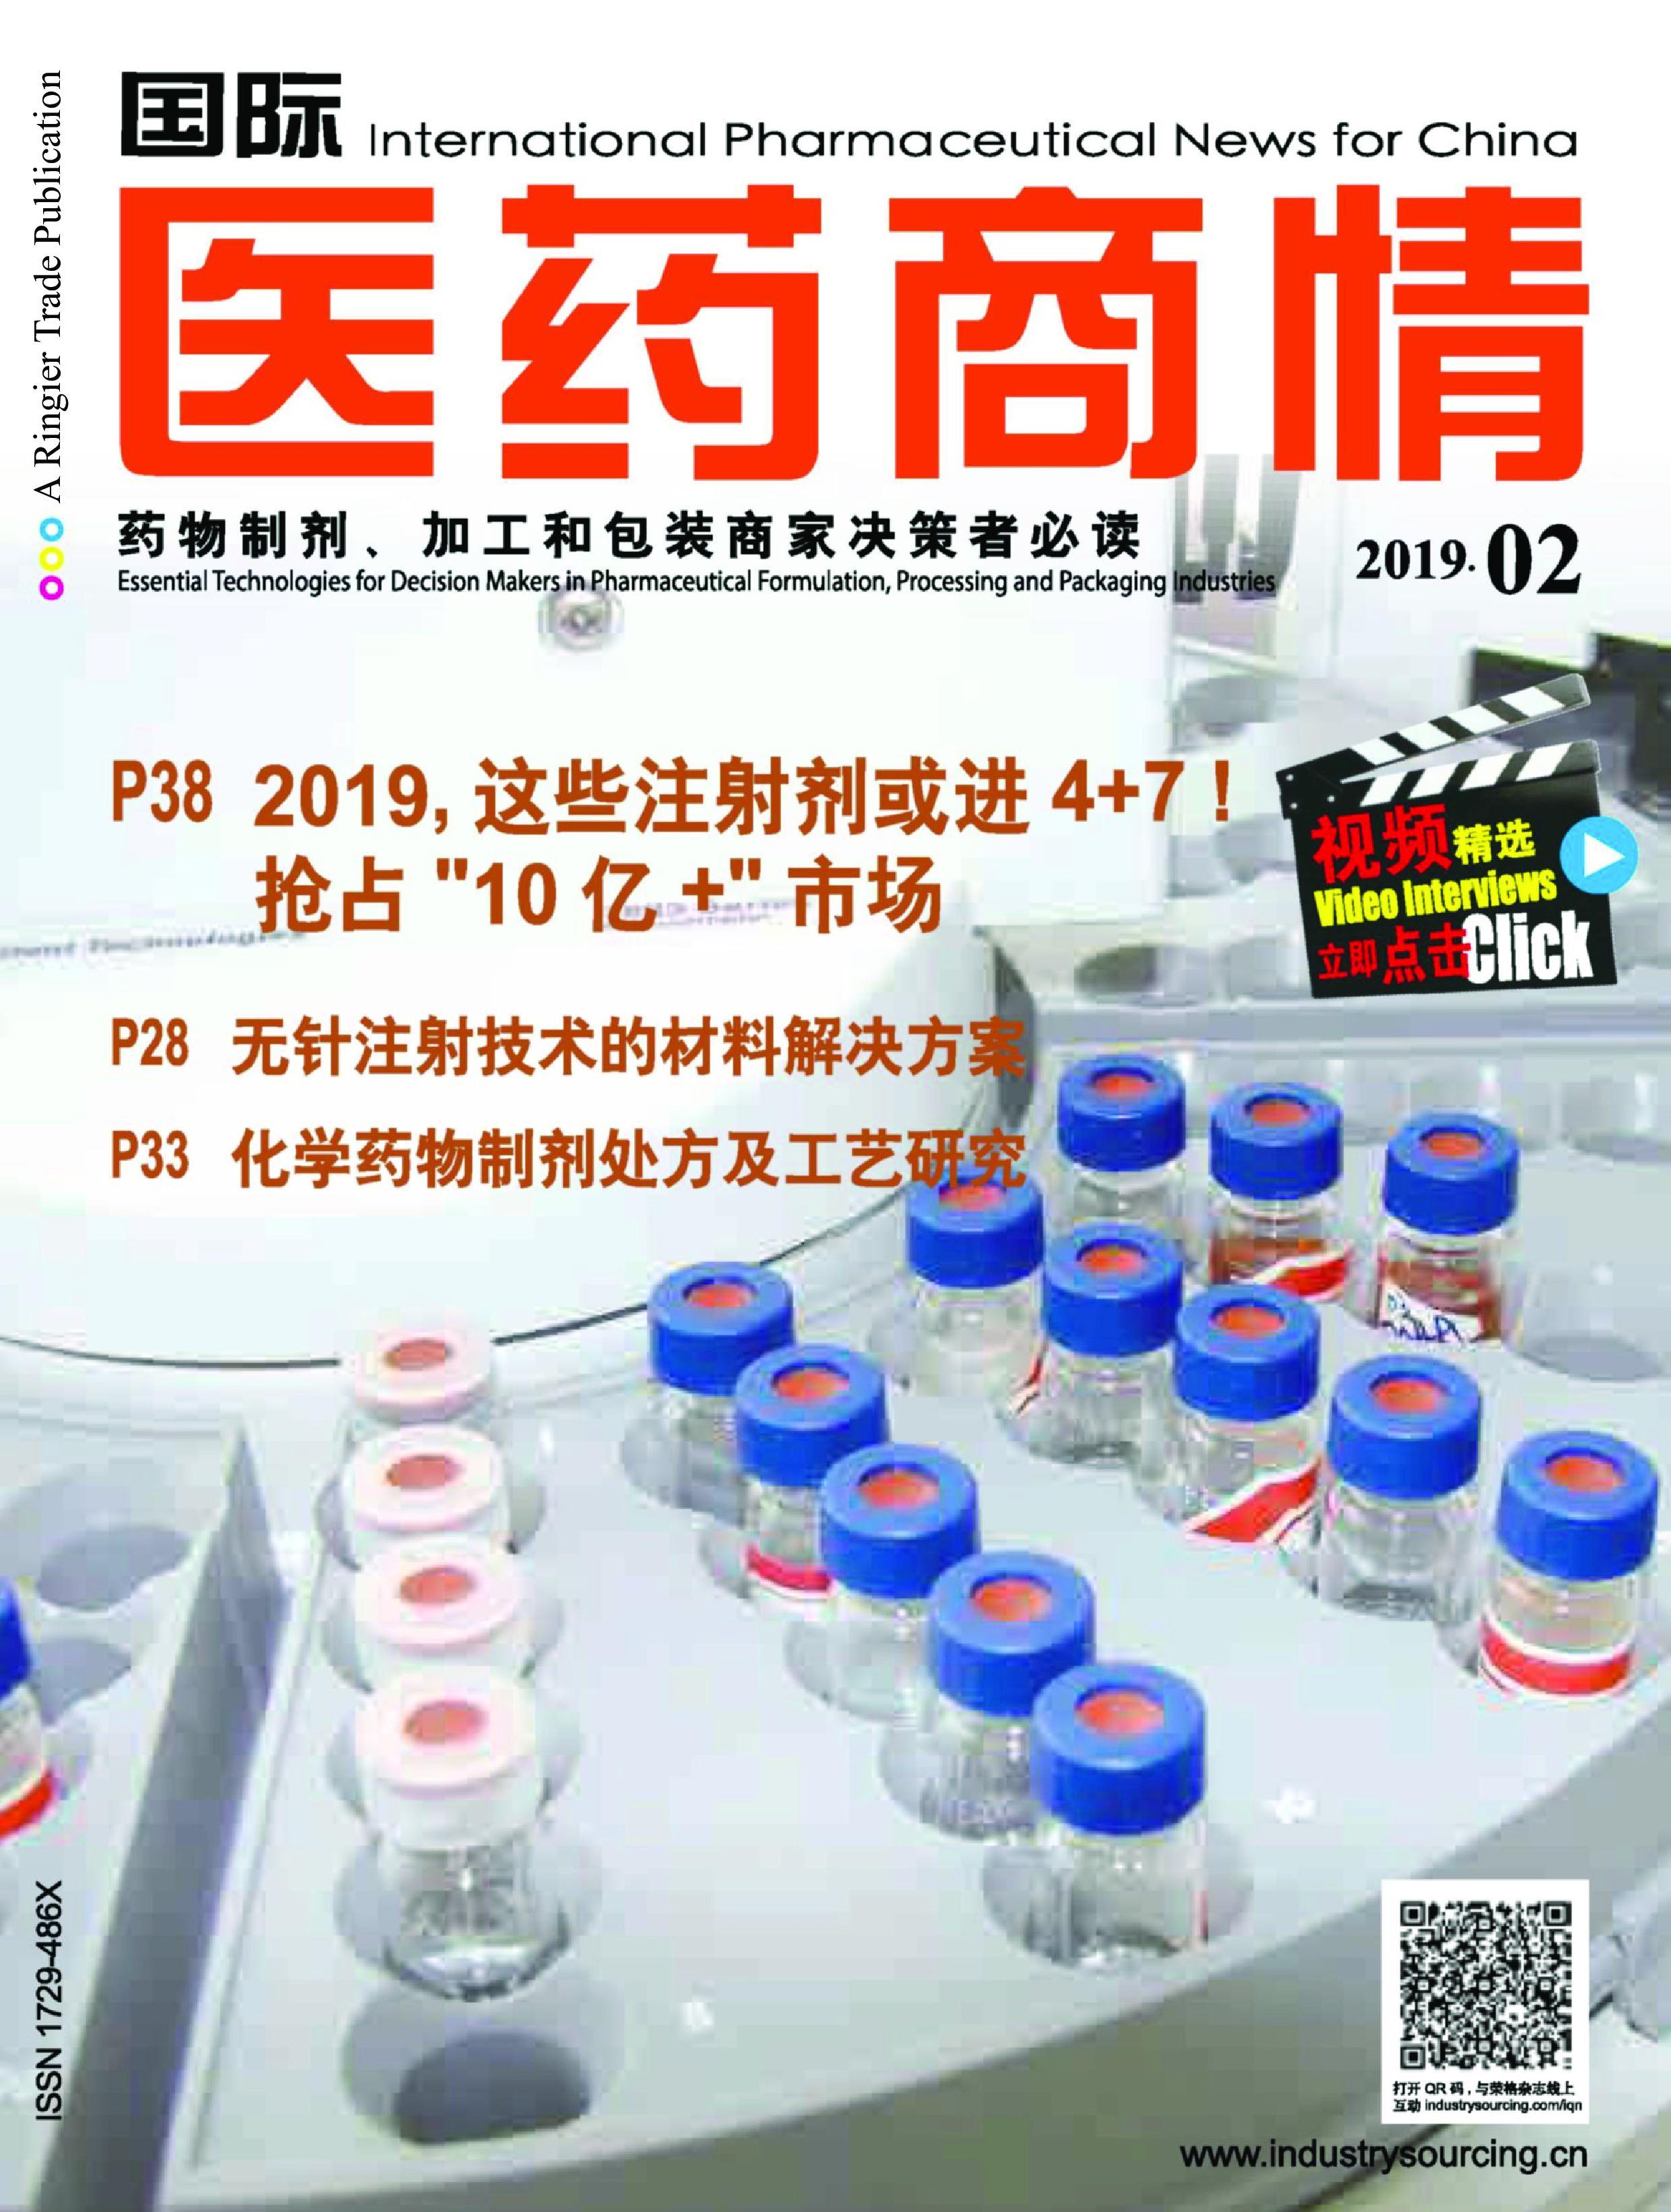 International Pharmaceutical News for China - 三月 11, 2019